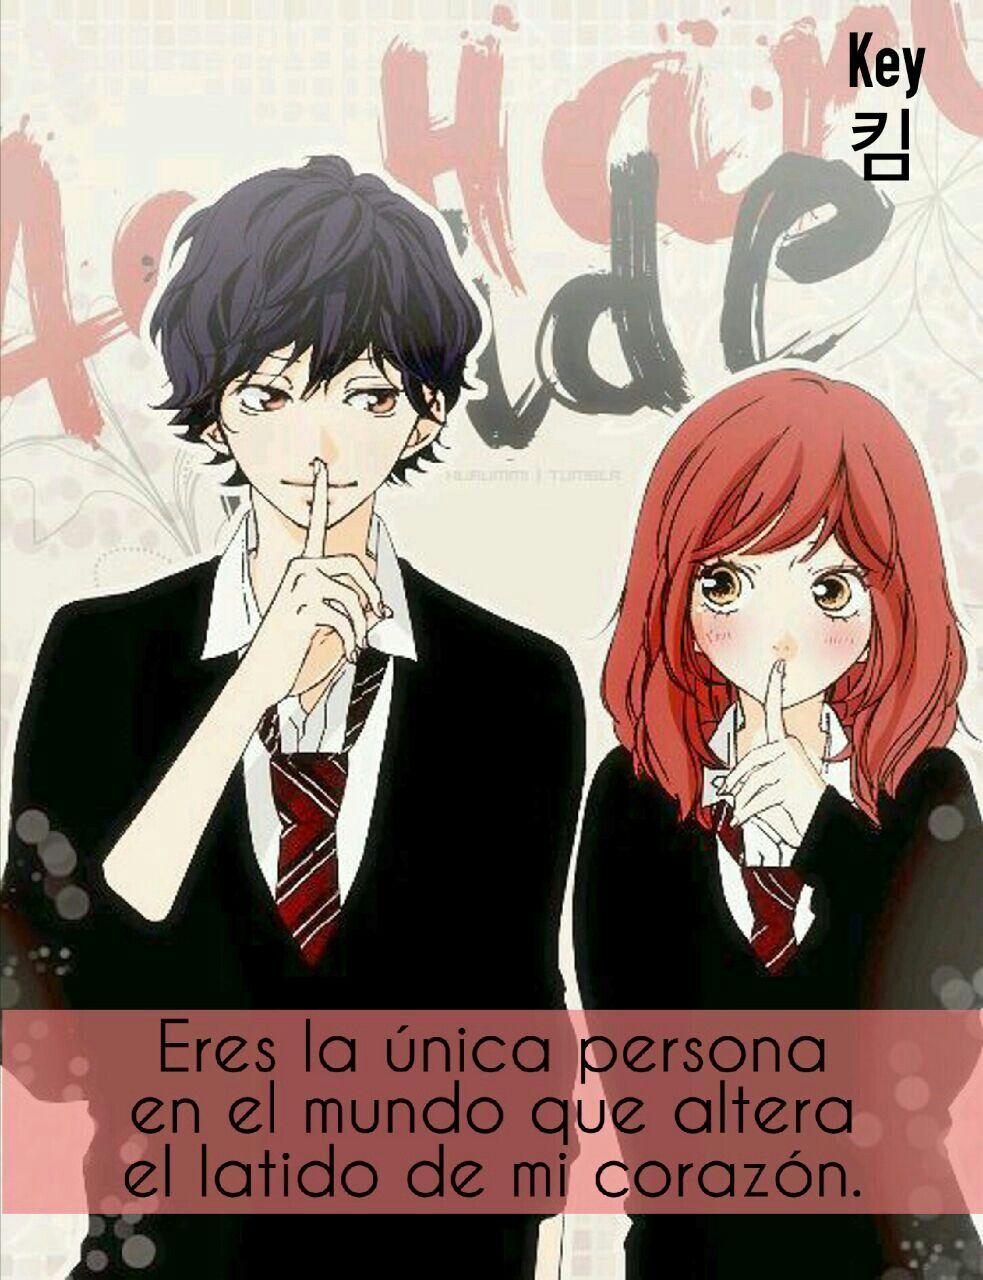 Eres La Unica Persona.... Frases Anime #Key킴